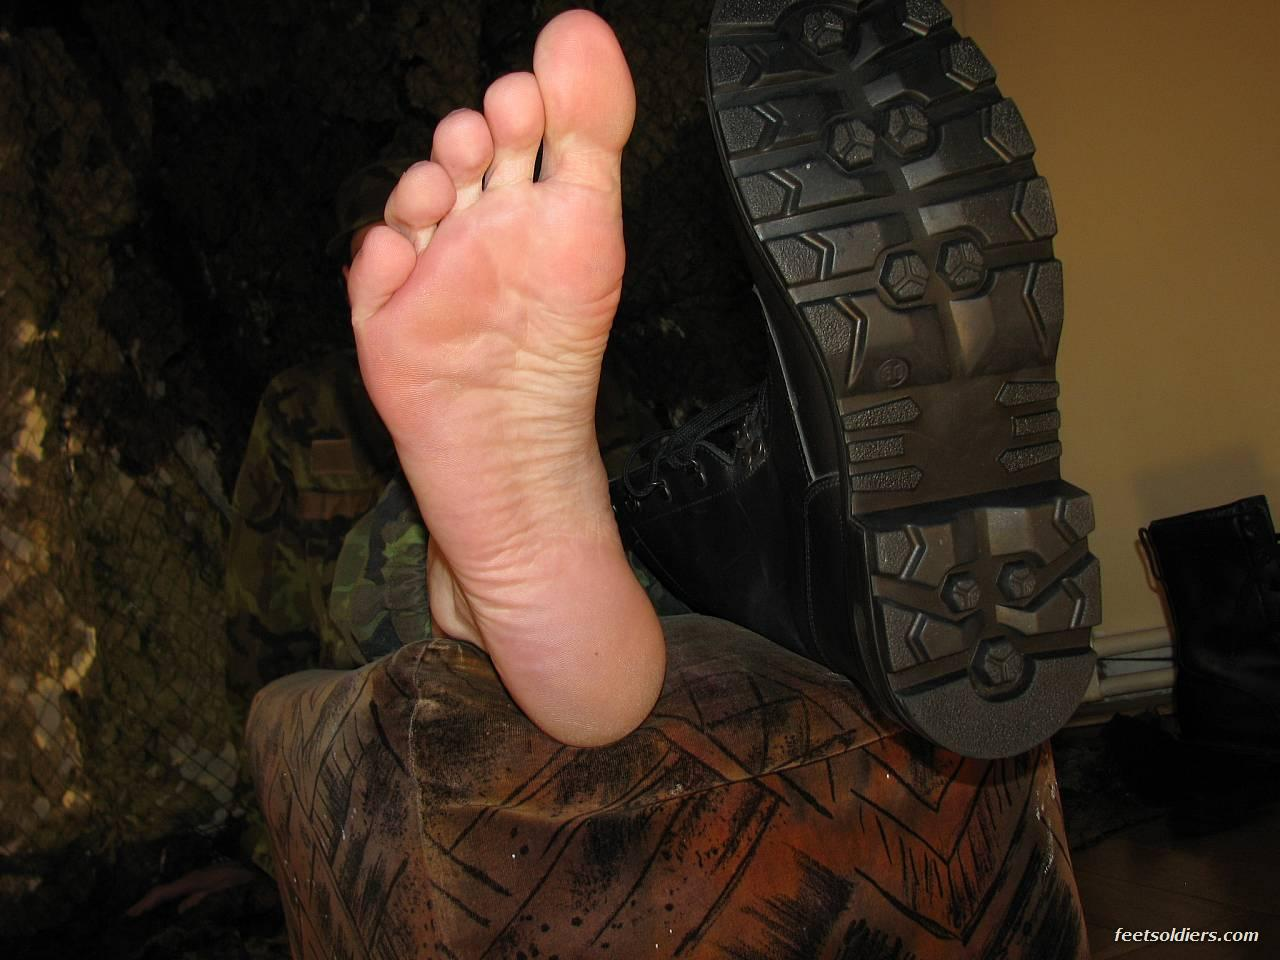 escort uomini gay piedi video